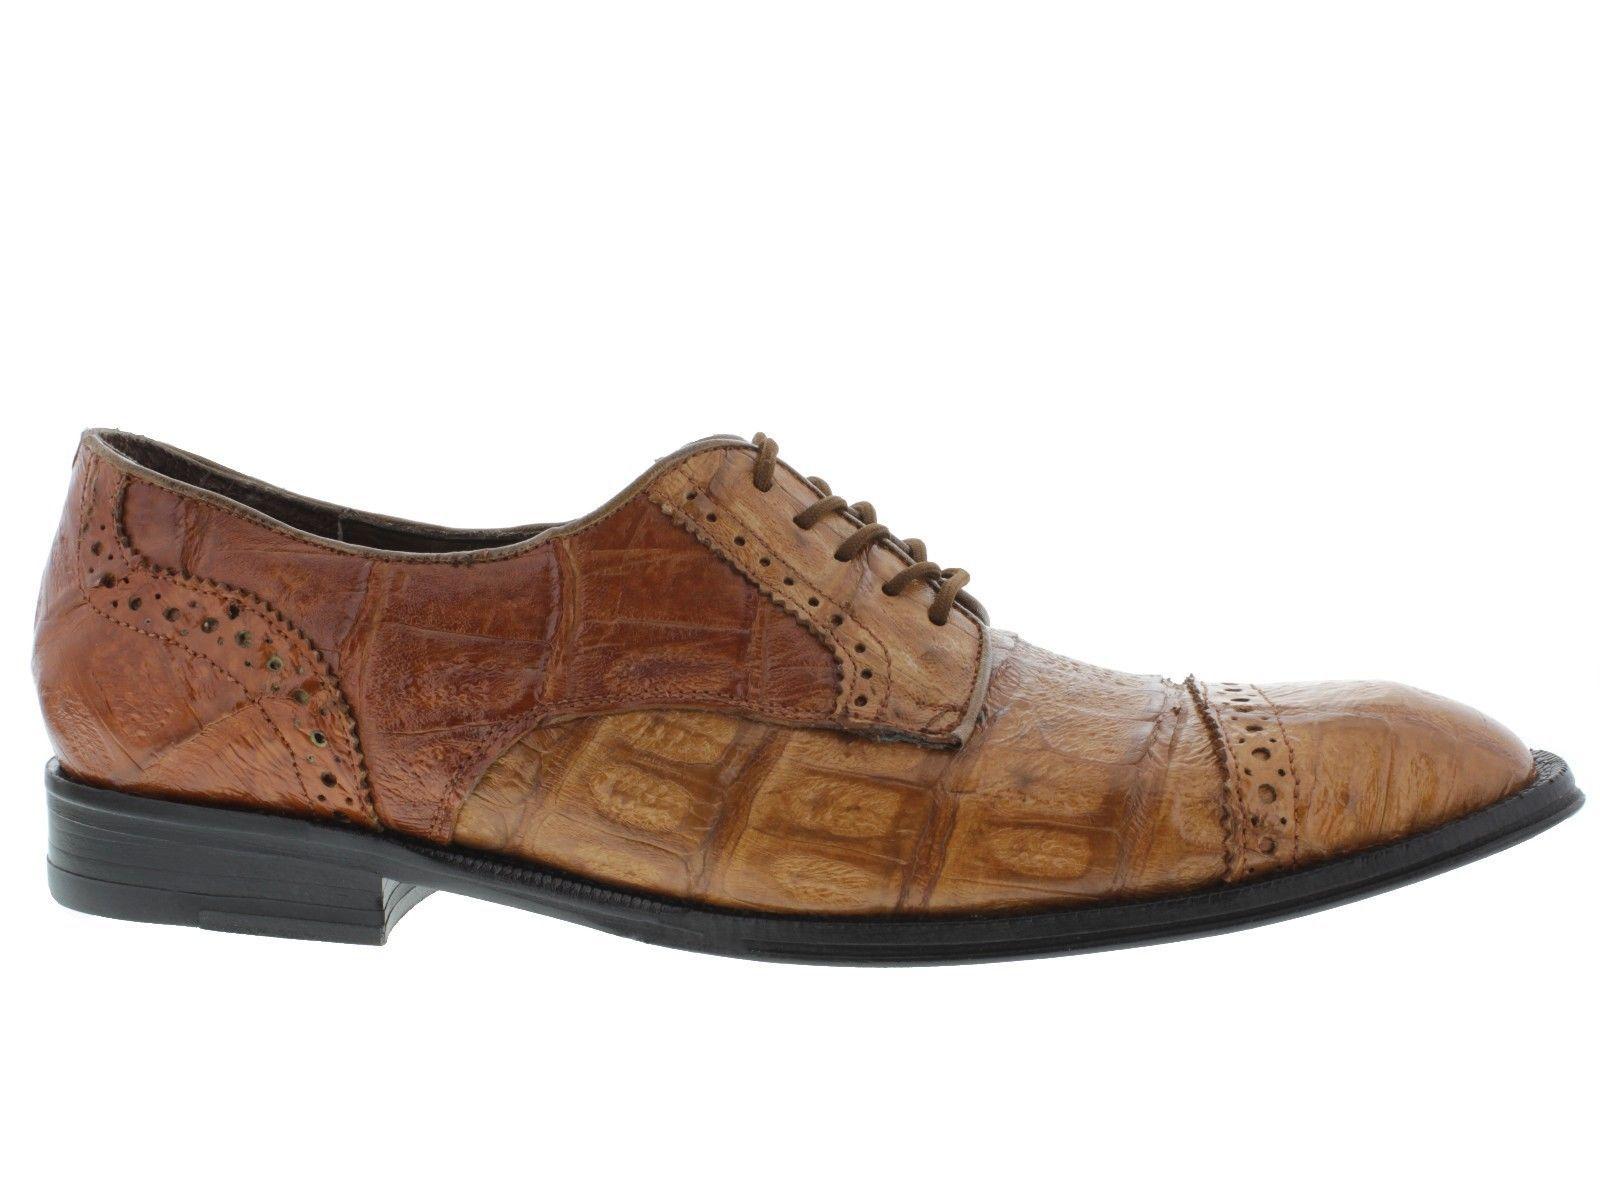 Men's dress shoes brown genuine crocodile alligator skin oxfords loafers cognac